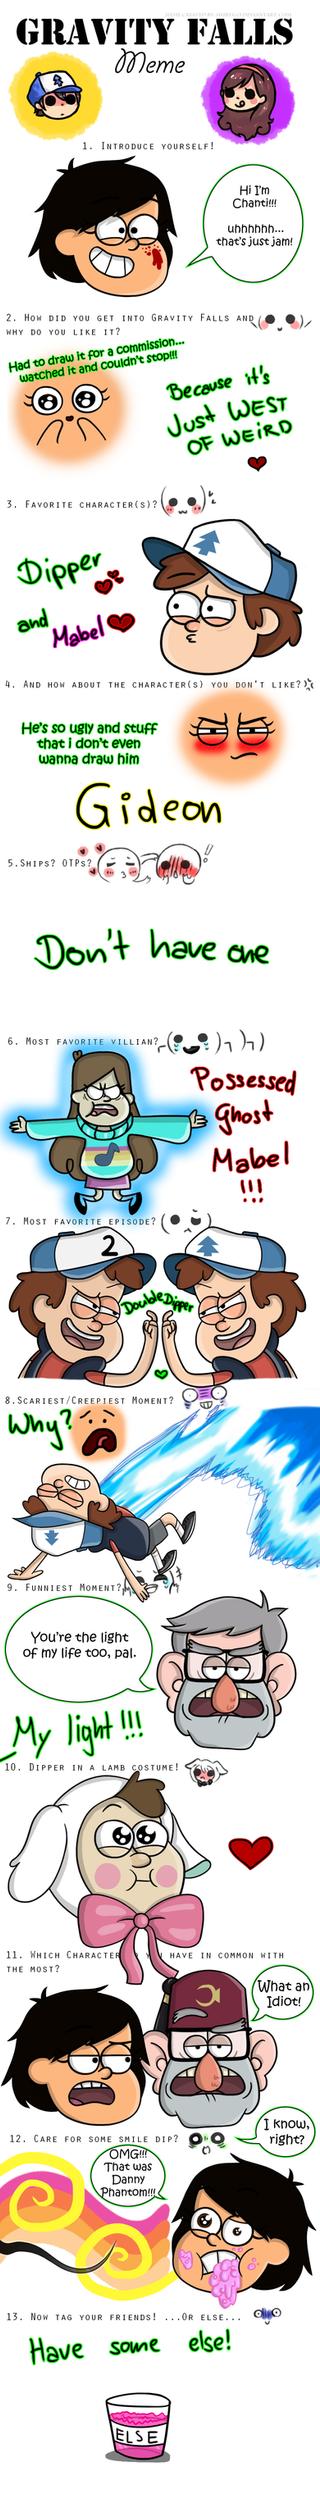 Gravity Falls MEME *3* by CwieChanti on DeviantArt